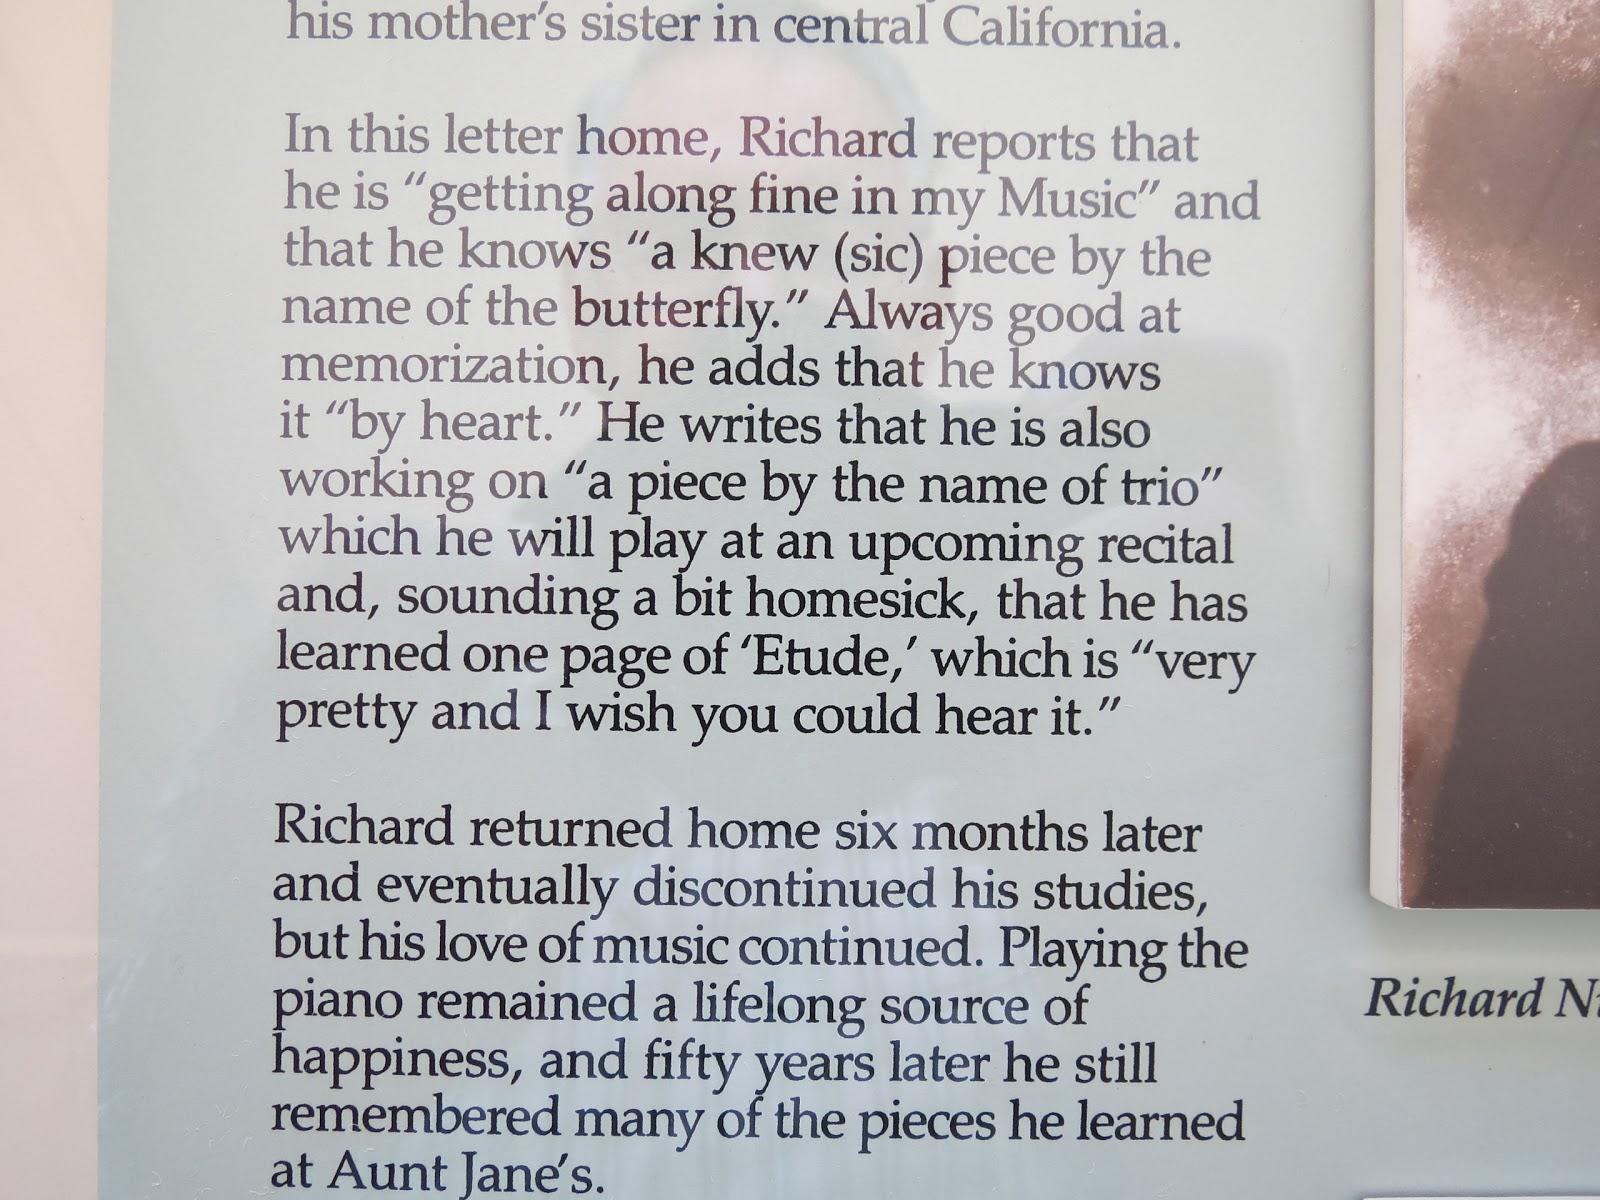 california dreams and realities - essay California dreams and realities readings for critical thinkers and writers california dreams and realities: readings for critical , california dreams and realities:.